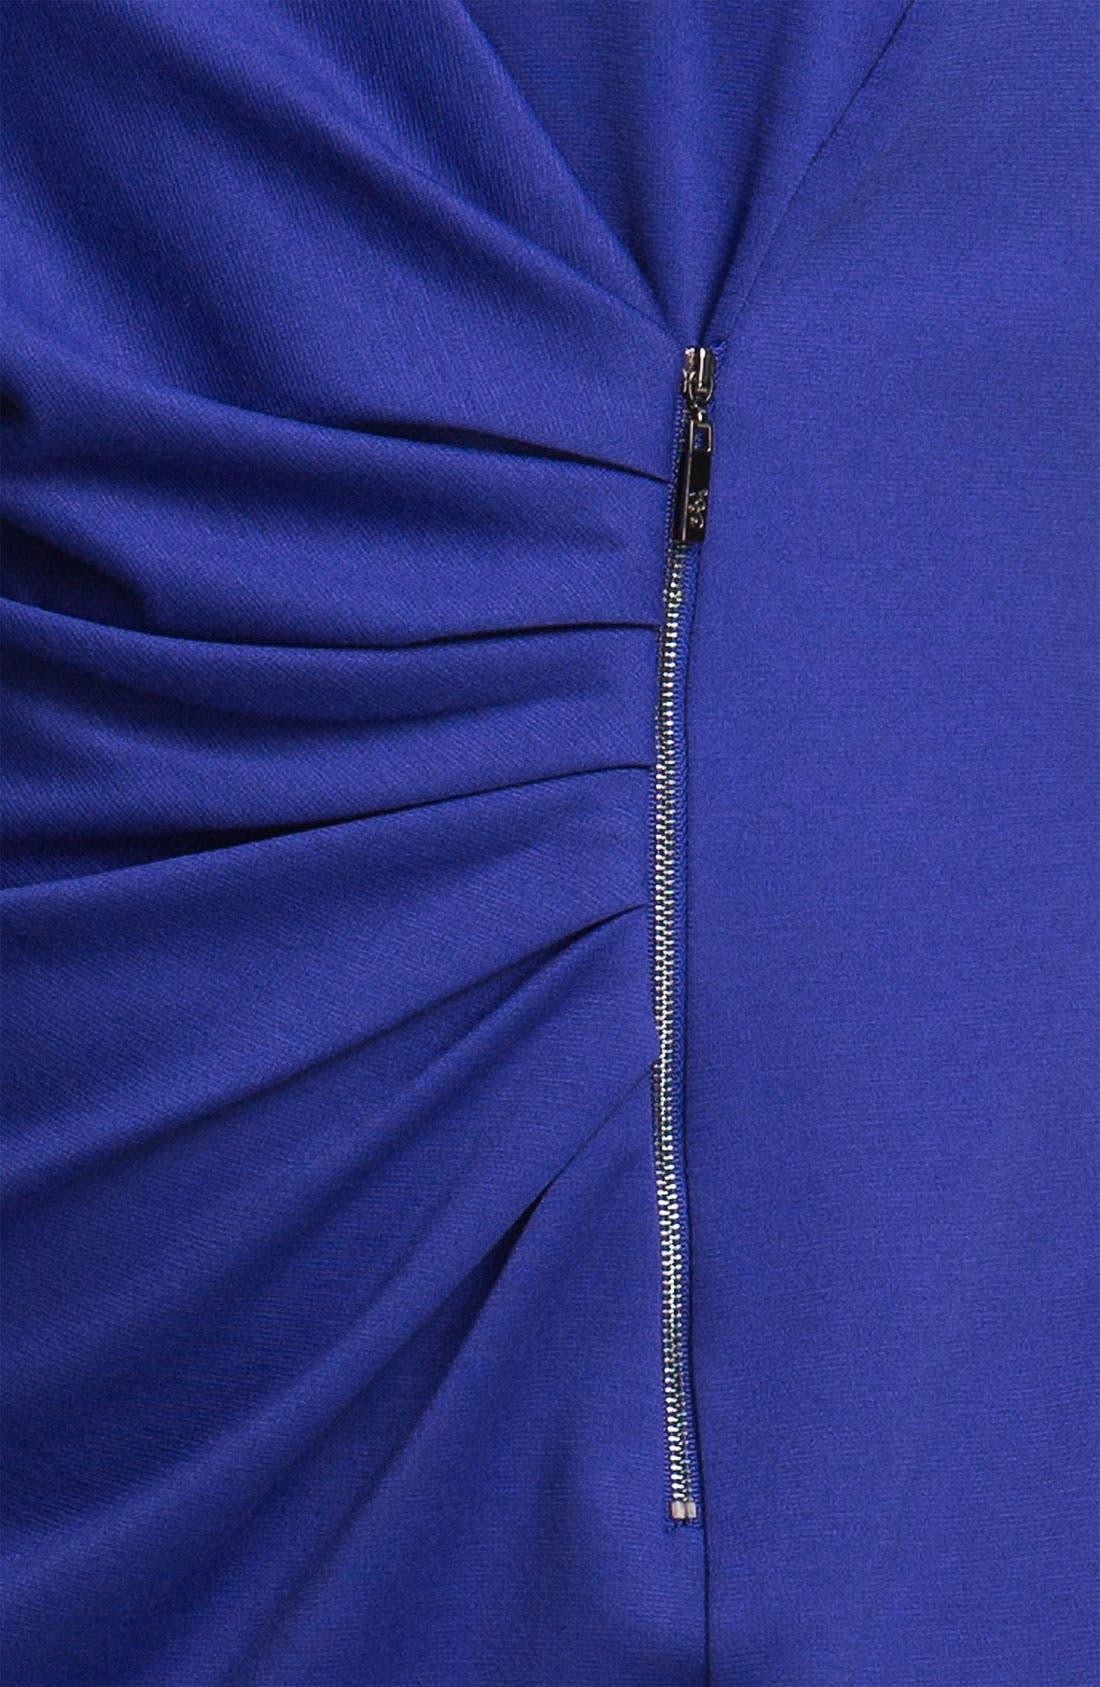 Alternate Image 3  - Jessica Simpson Zipper Detail Ponte Knit Sheath Dress (Plus)